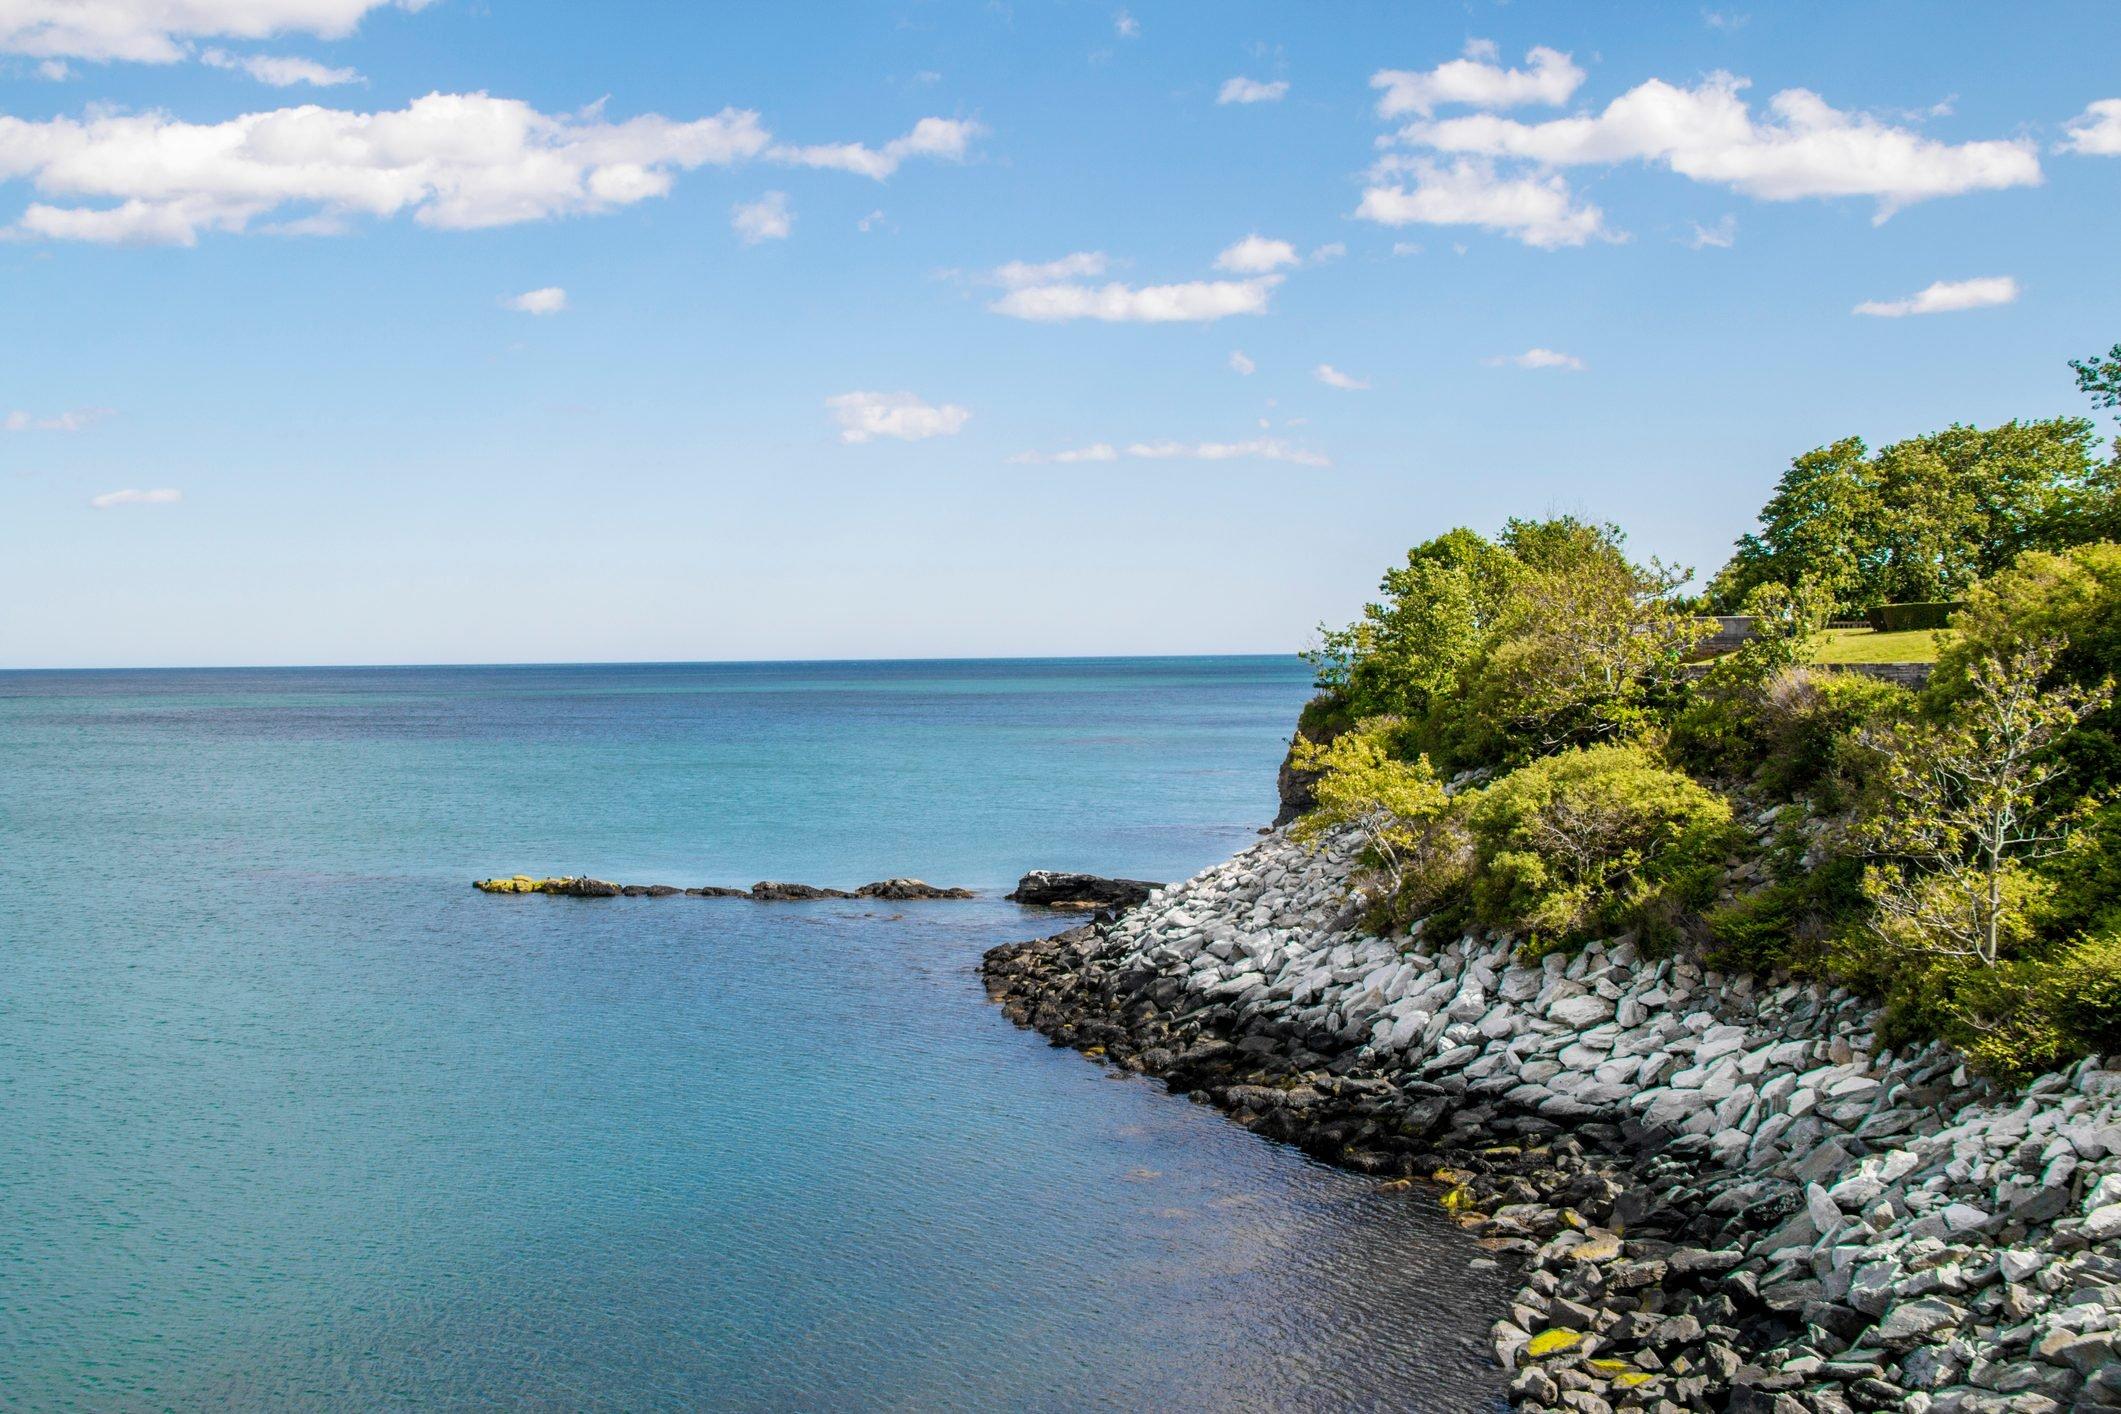 ocean view from the cliff walk in Newport Rhode Island